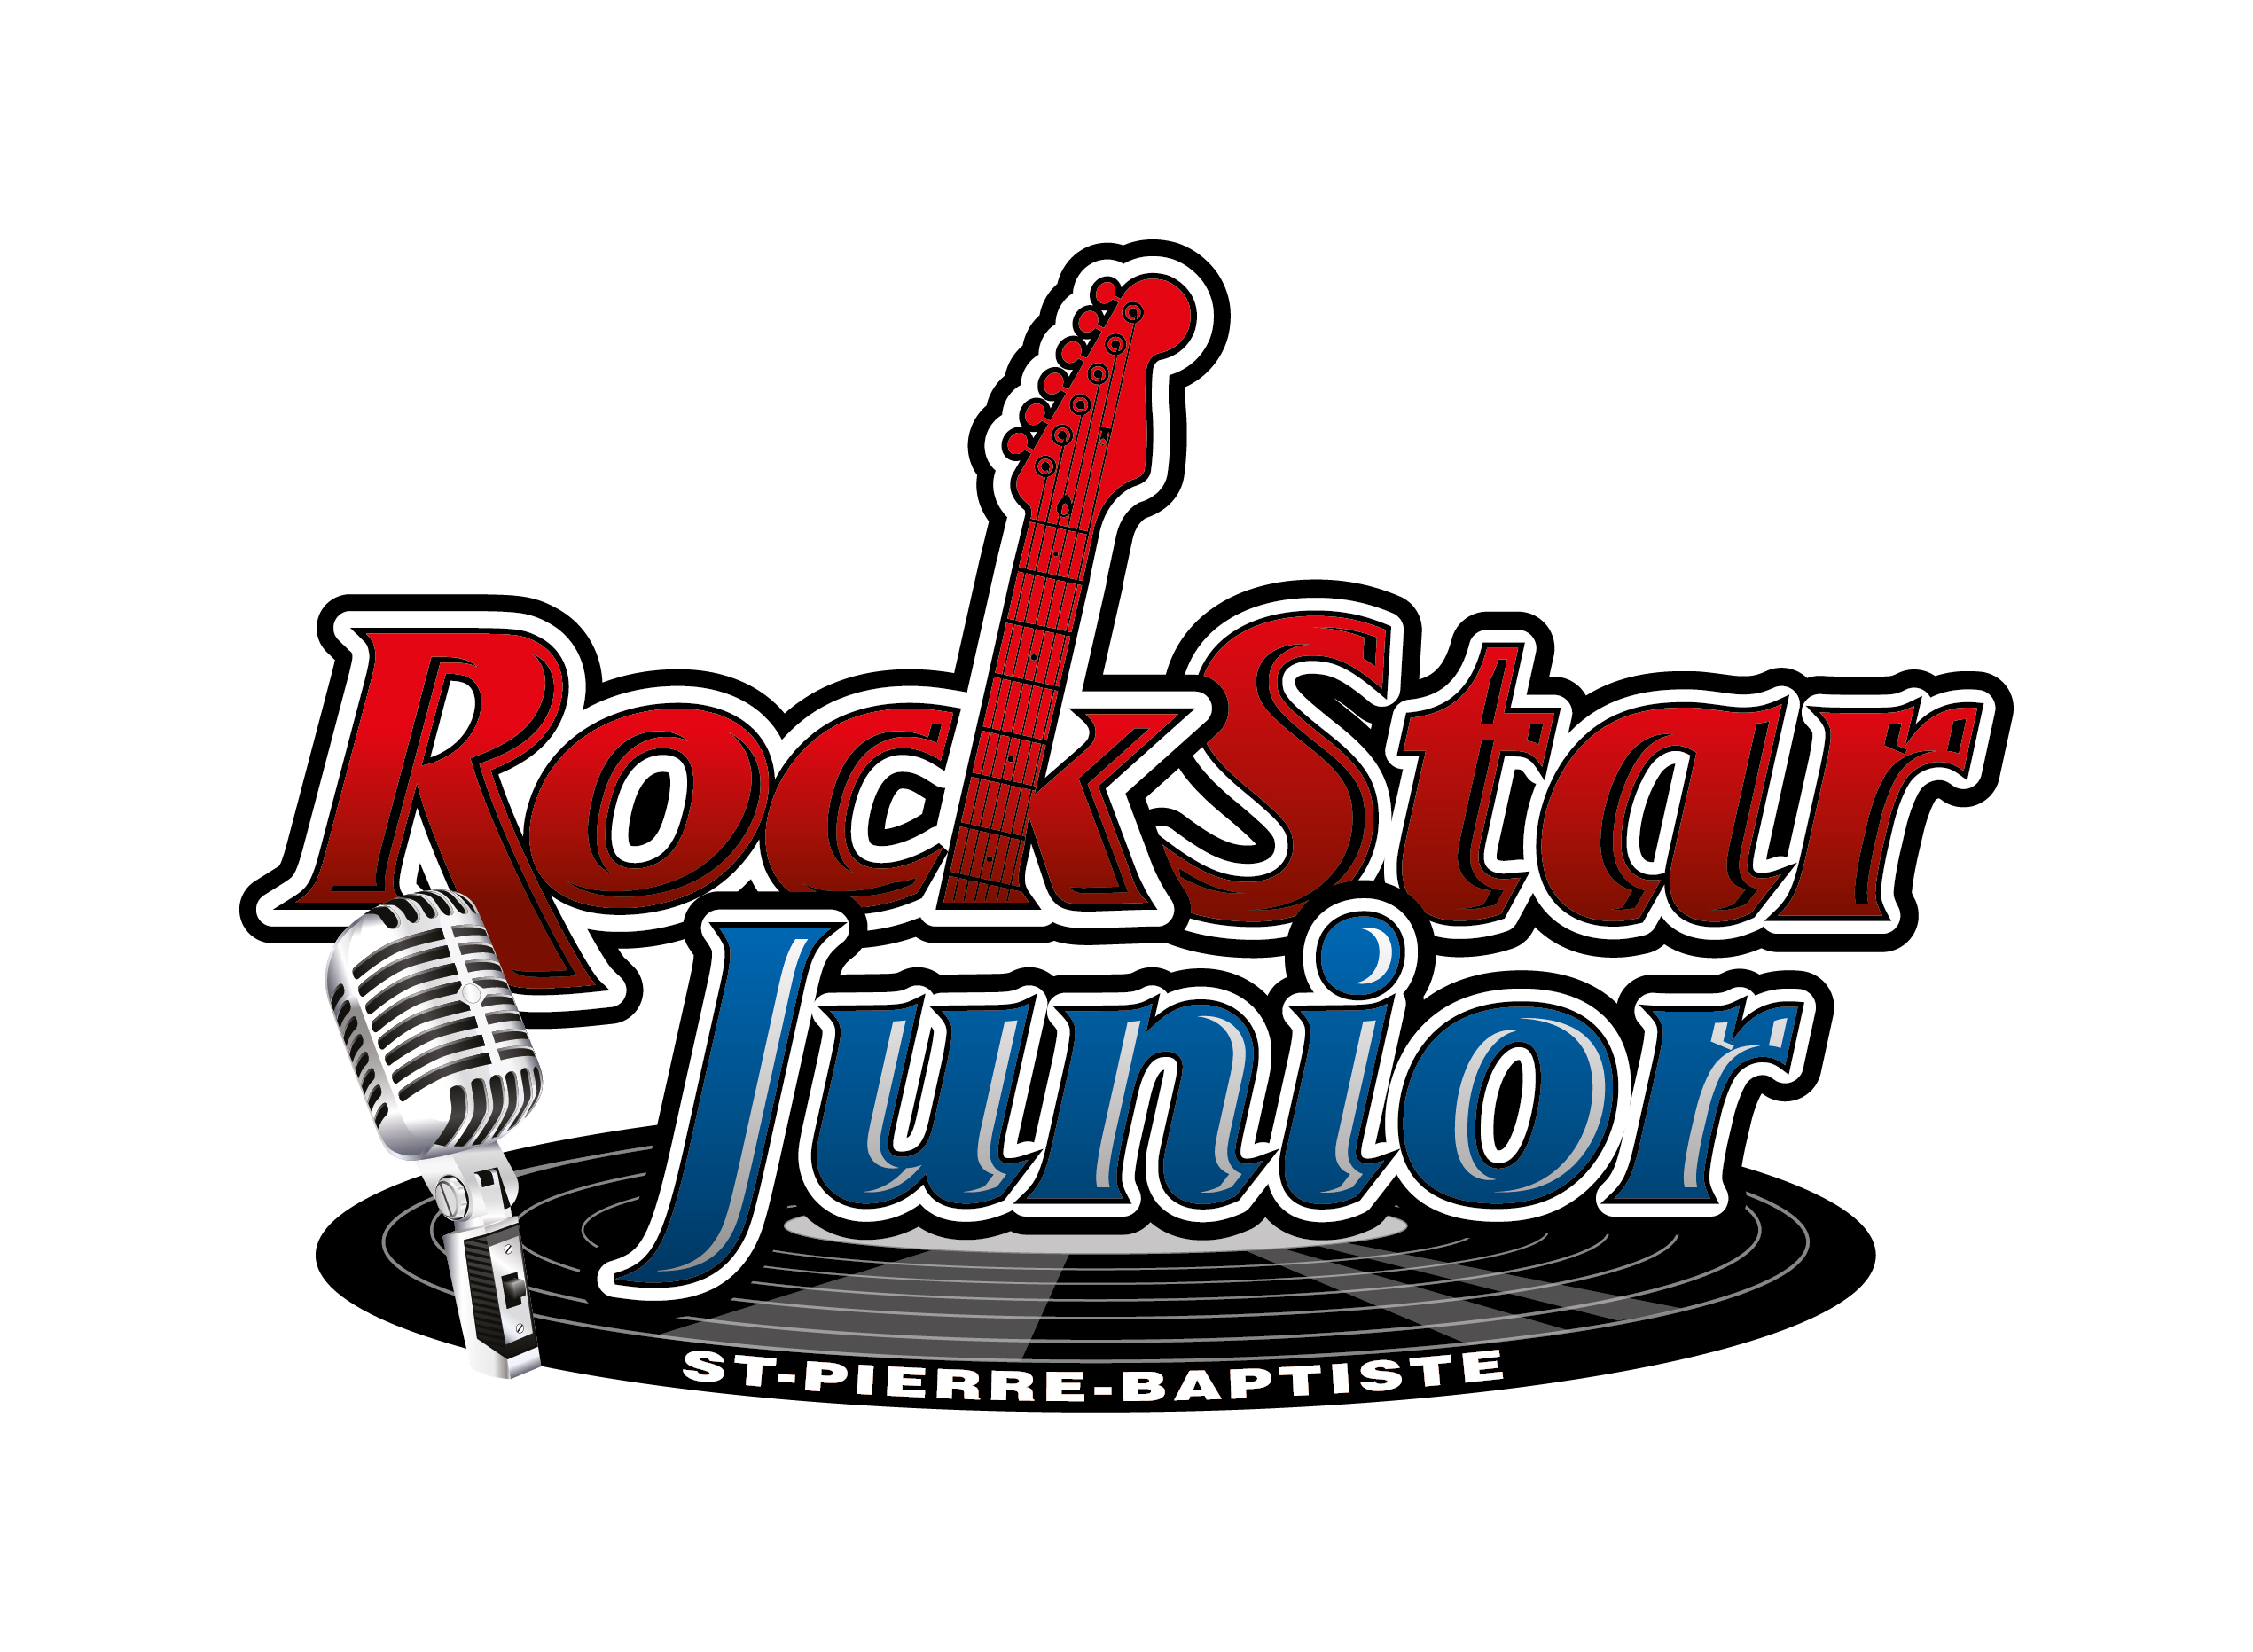 images/logo-rockstar-horaire.jpg